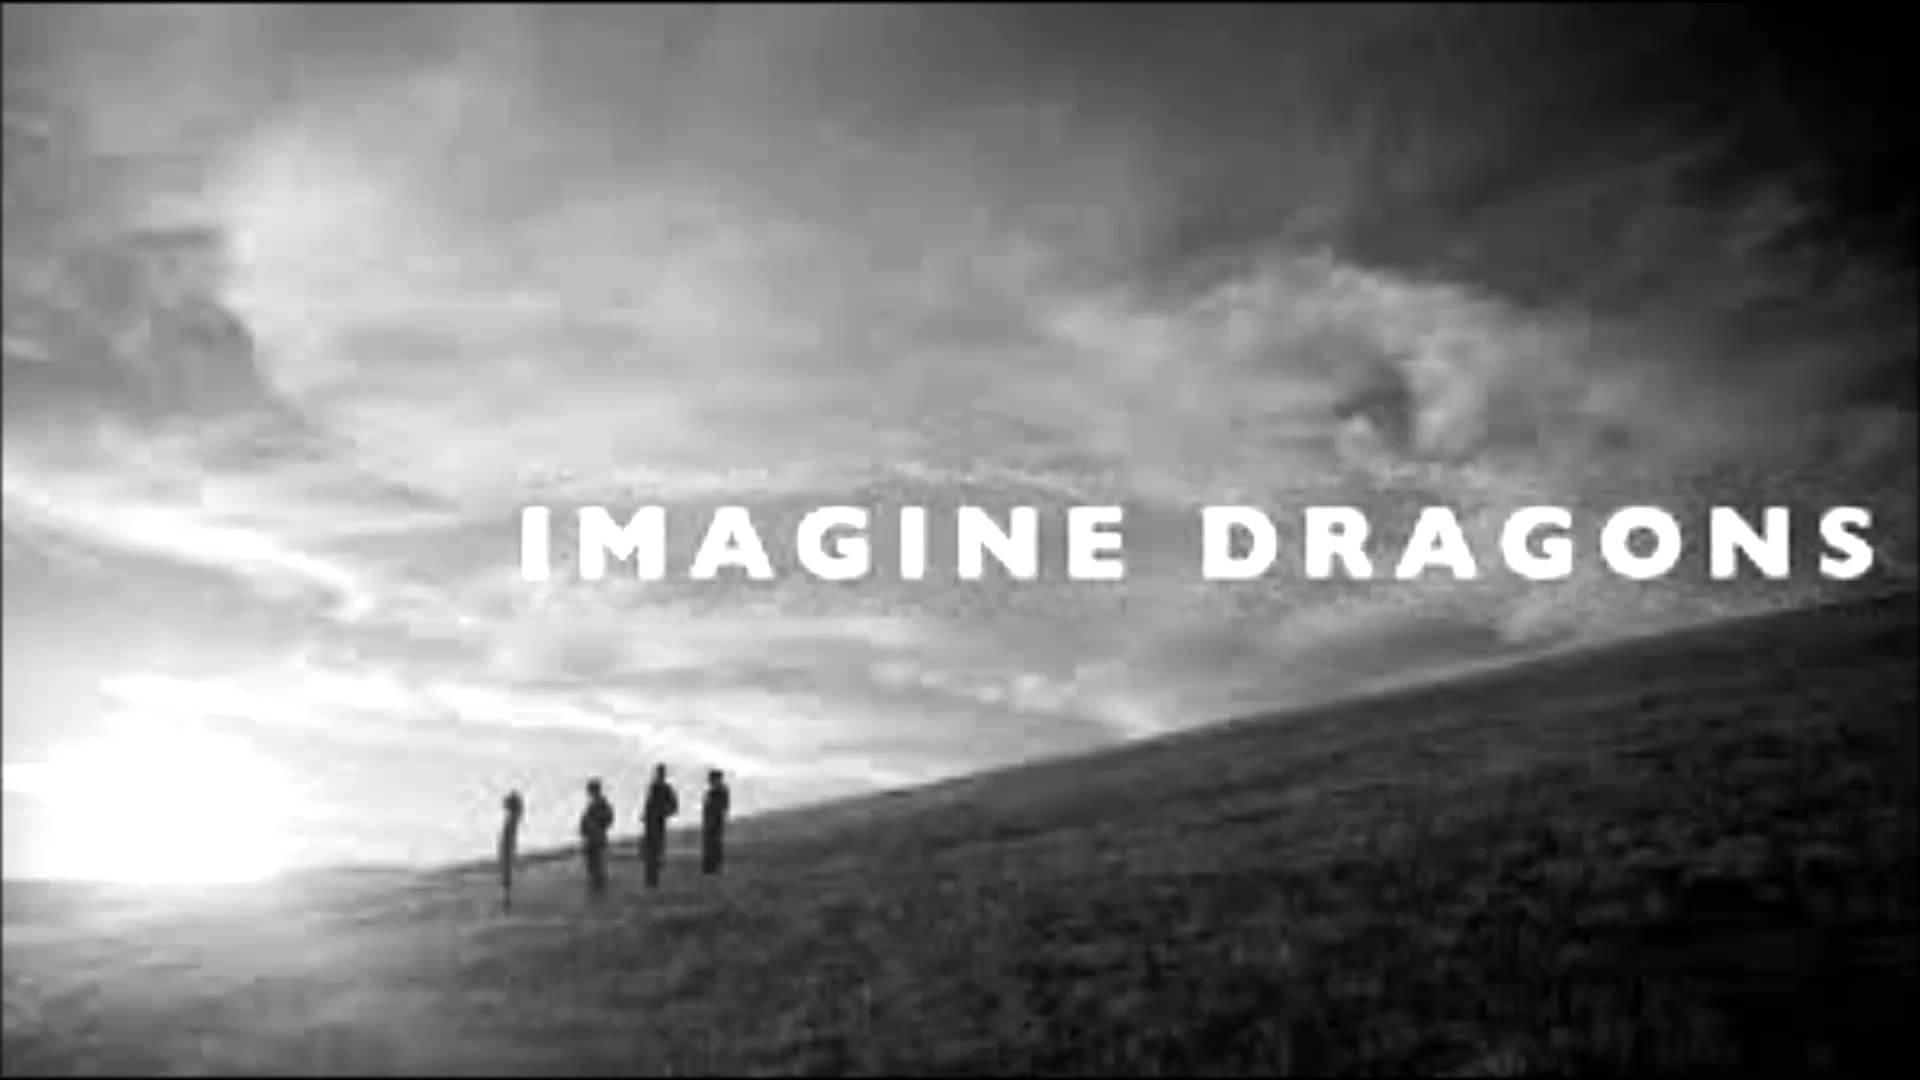 imagine dragons wallpapers wallpaper cave